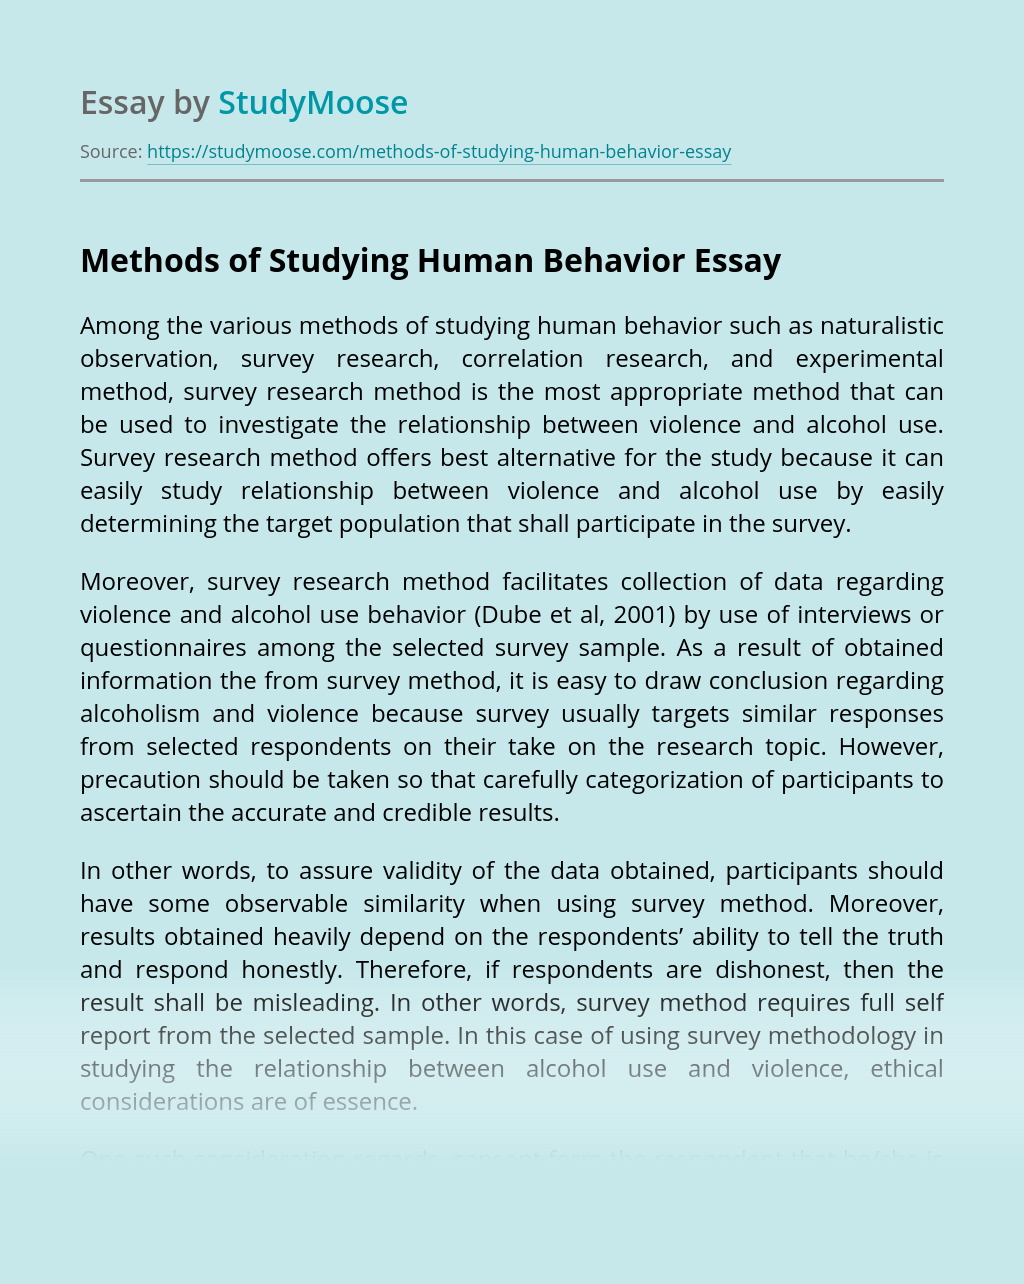 Methods of Studying Human Behavior